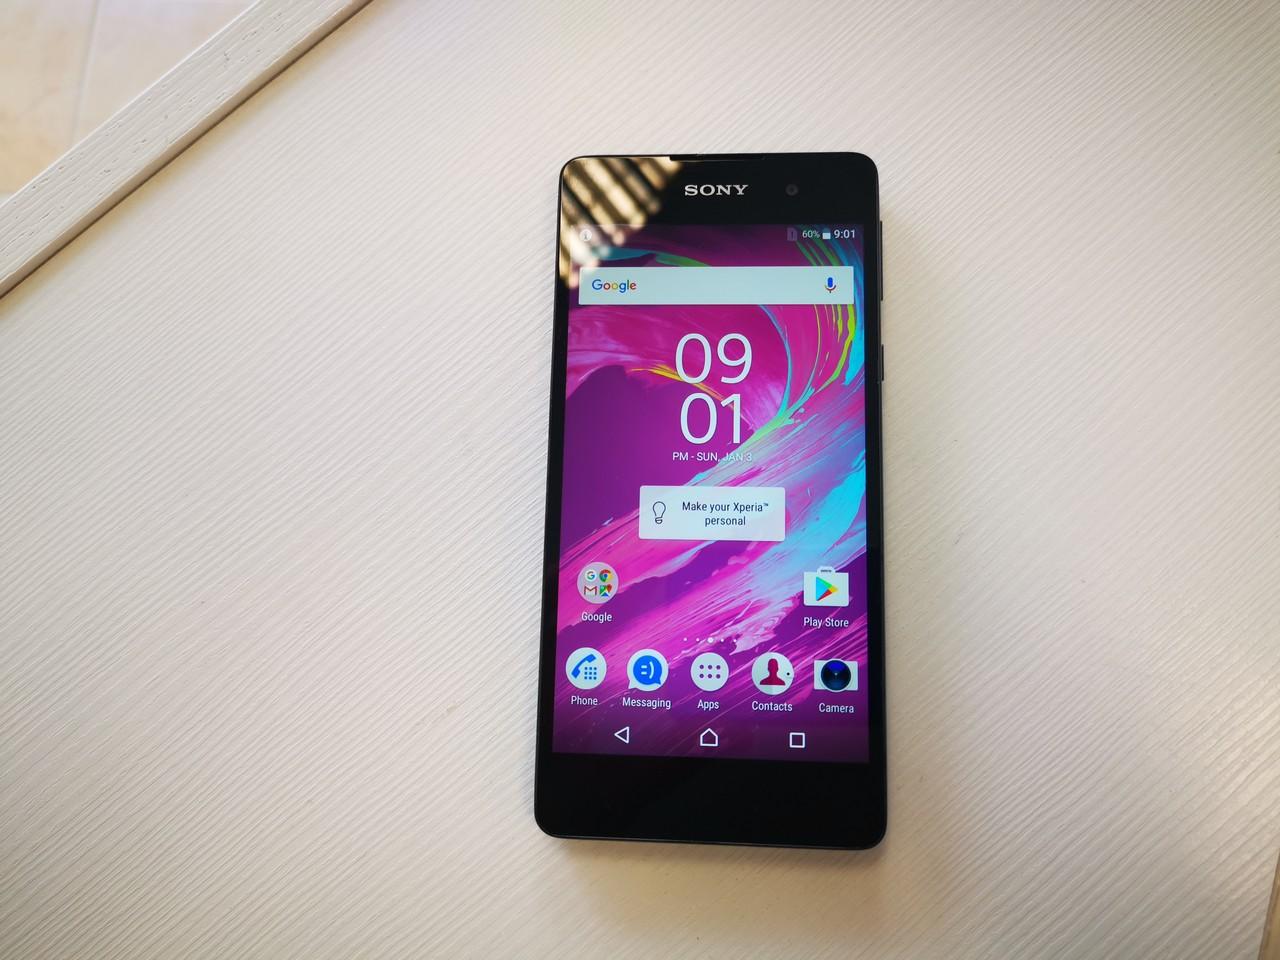 картинка Naudotas Sony Xperia E5 su 4G Lte от магазина Одежда+